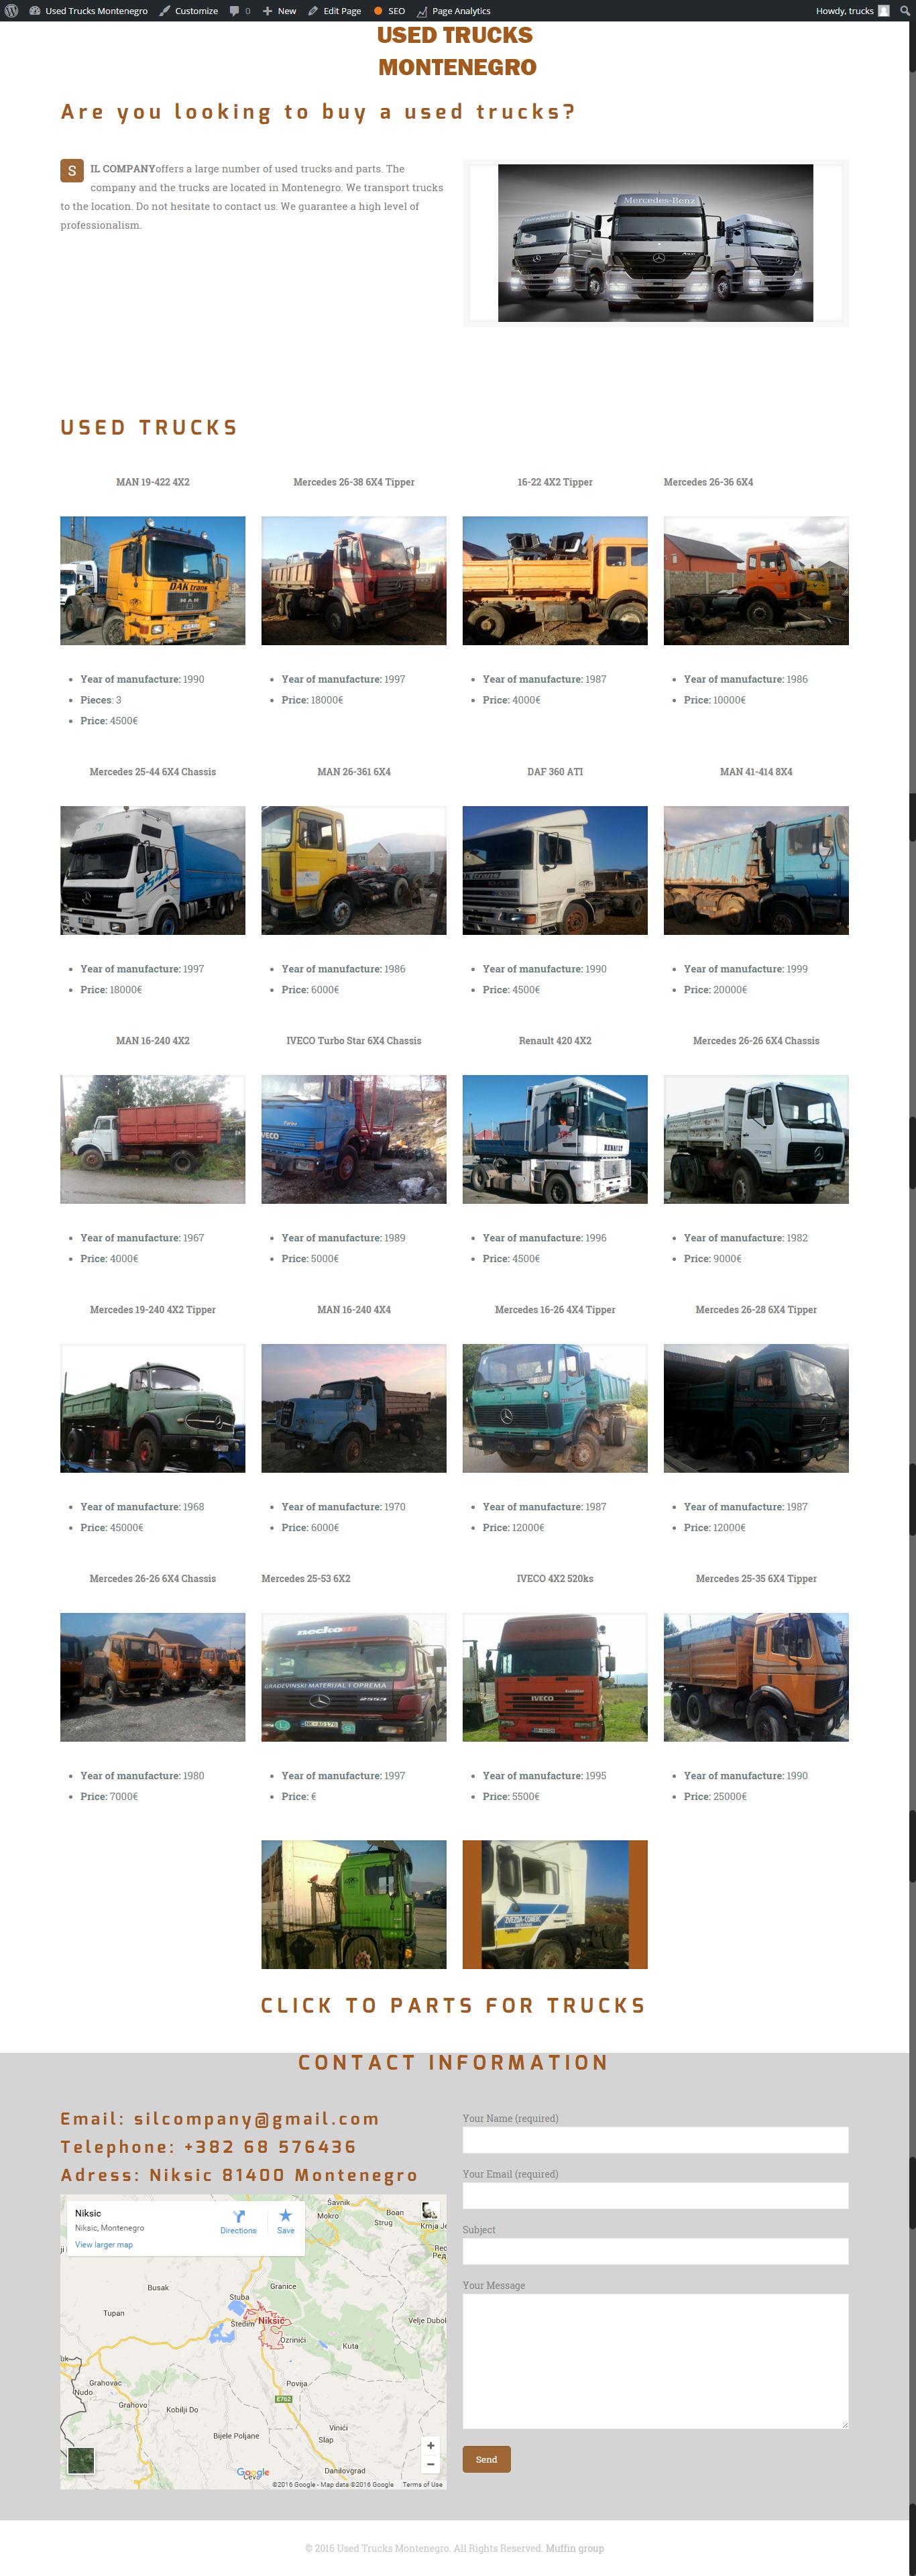 used trucks montenegro